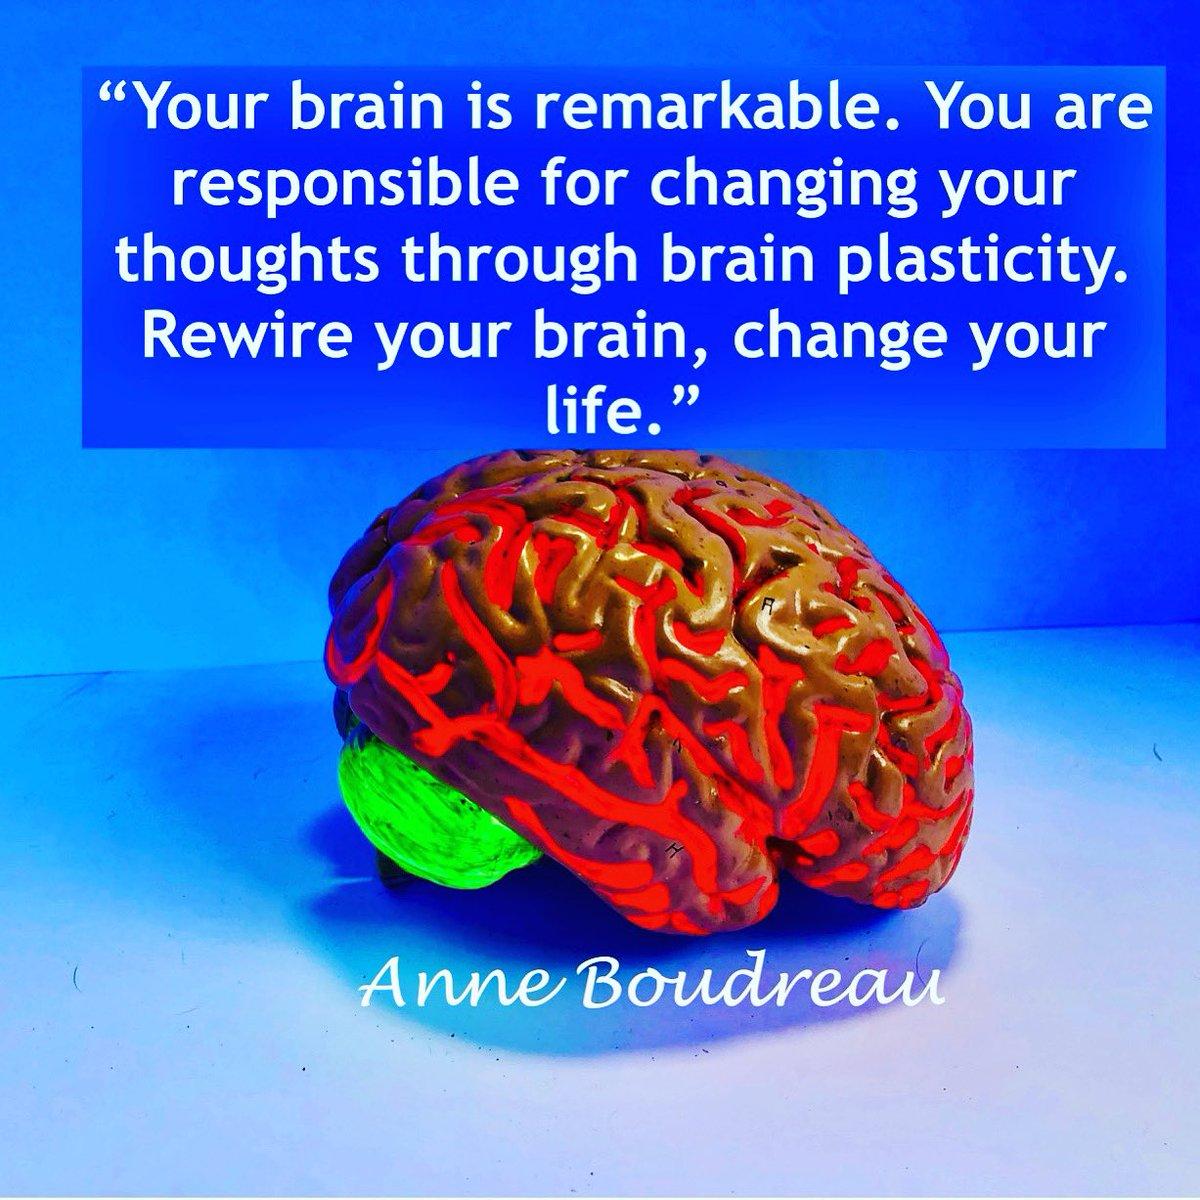 Anyone can change thoughts & behavior via neuroplasticity  never underestimate your brain. #brain #power #brainpower #brainhealth #rewireyourbrain #change #selfcare #negative #toxins #release #negativity #brainplasticity #Remarkable #antiaging #preventativehealth #health #rewire